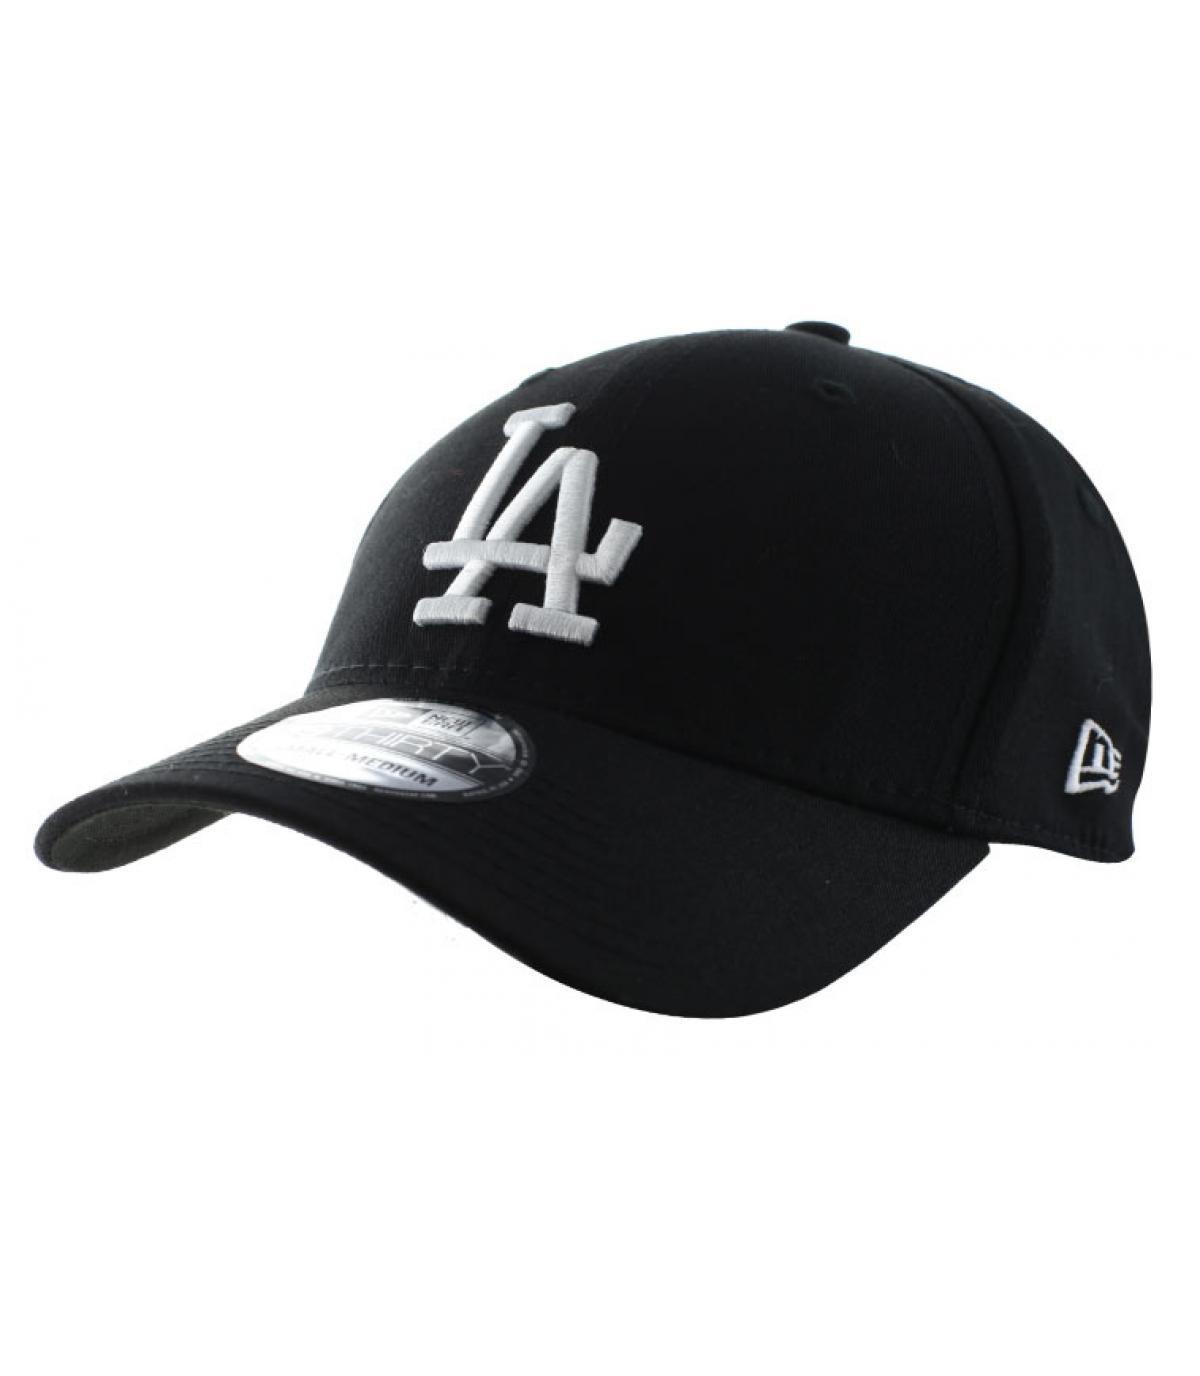 Dettagli League Ess LA 9Forty black white - image 2